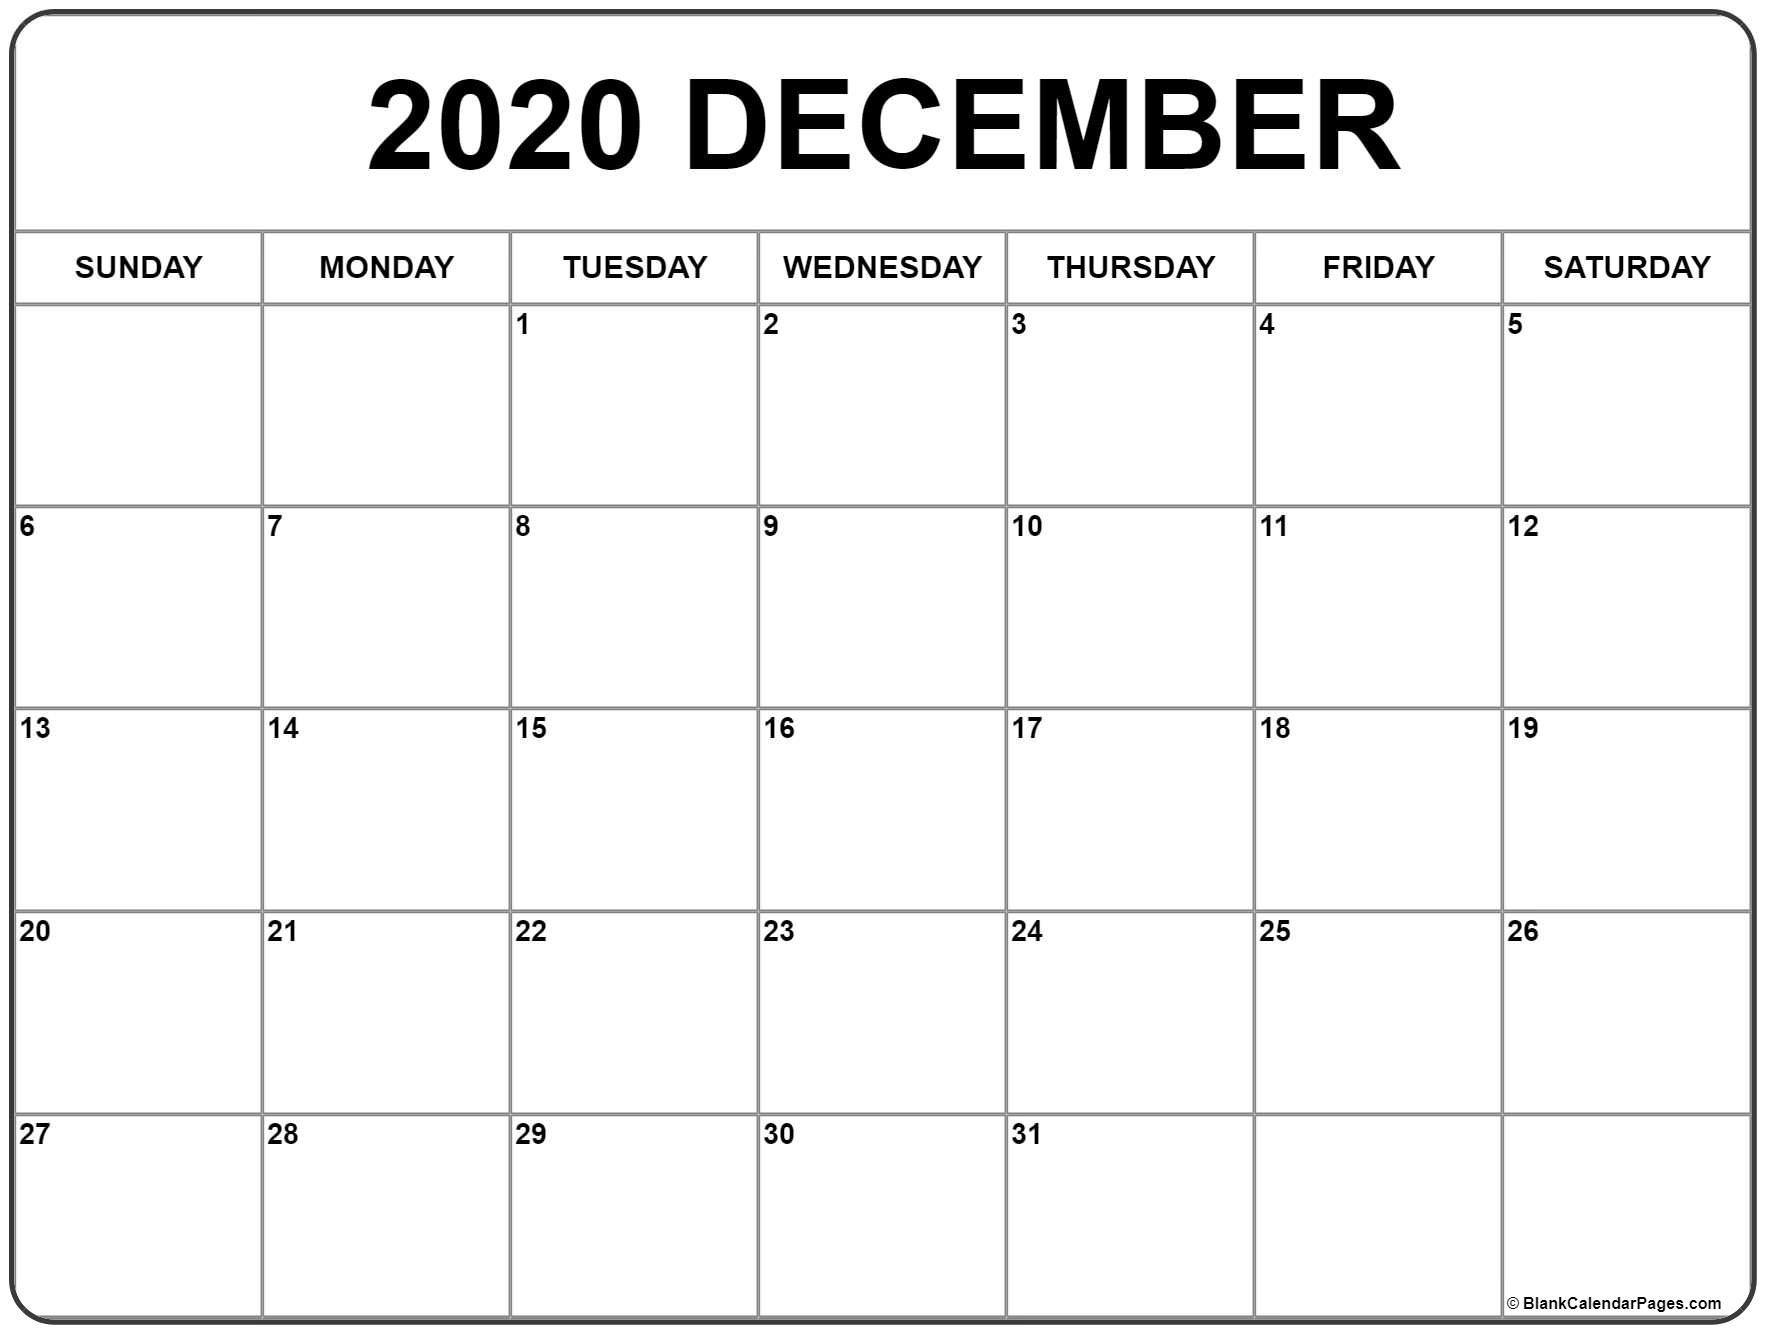 December 2020 Printable Calendar Template #2020Calendars_Blank Calendar May 2020 Pdf